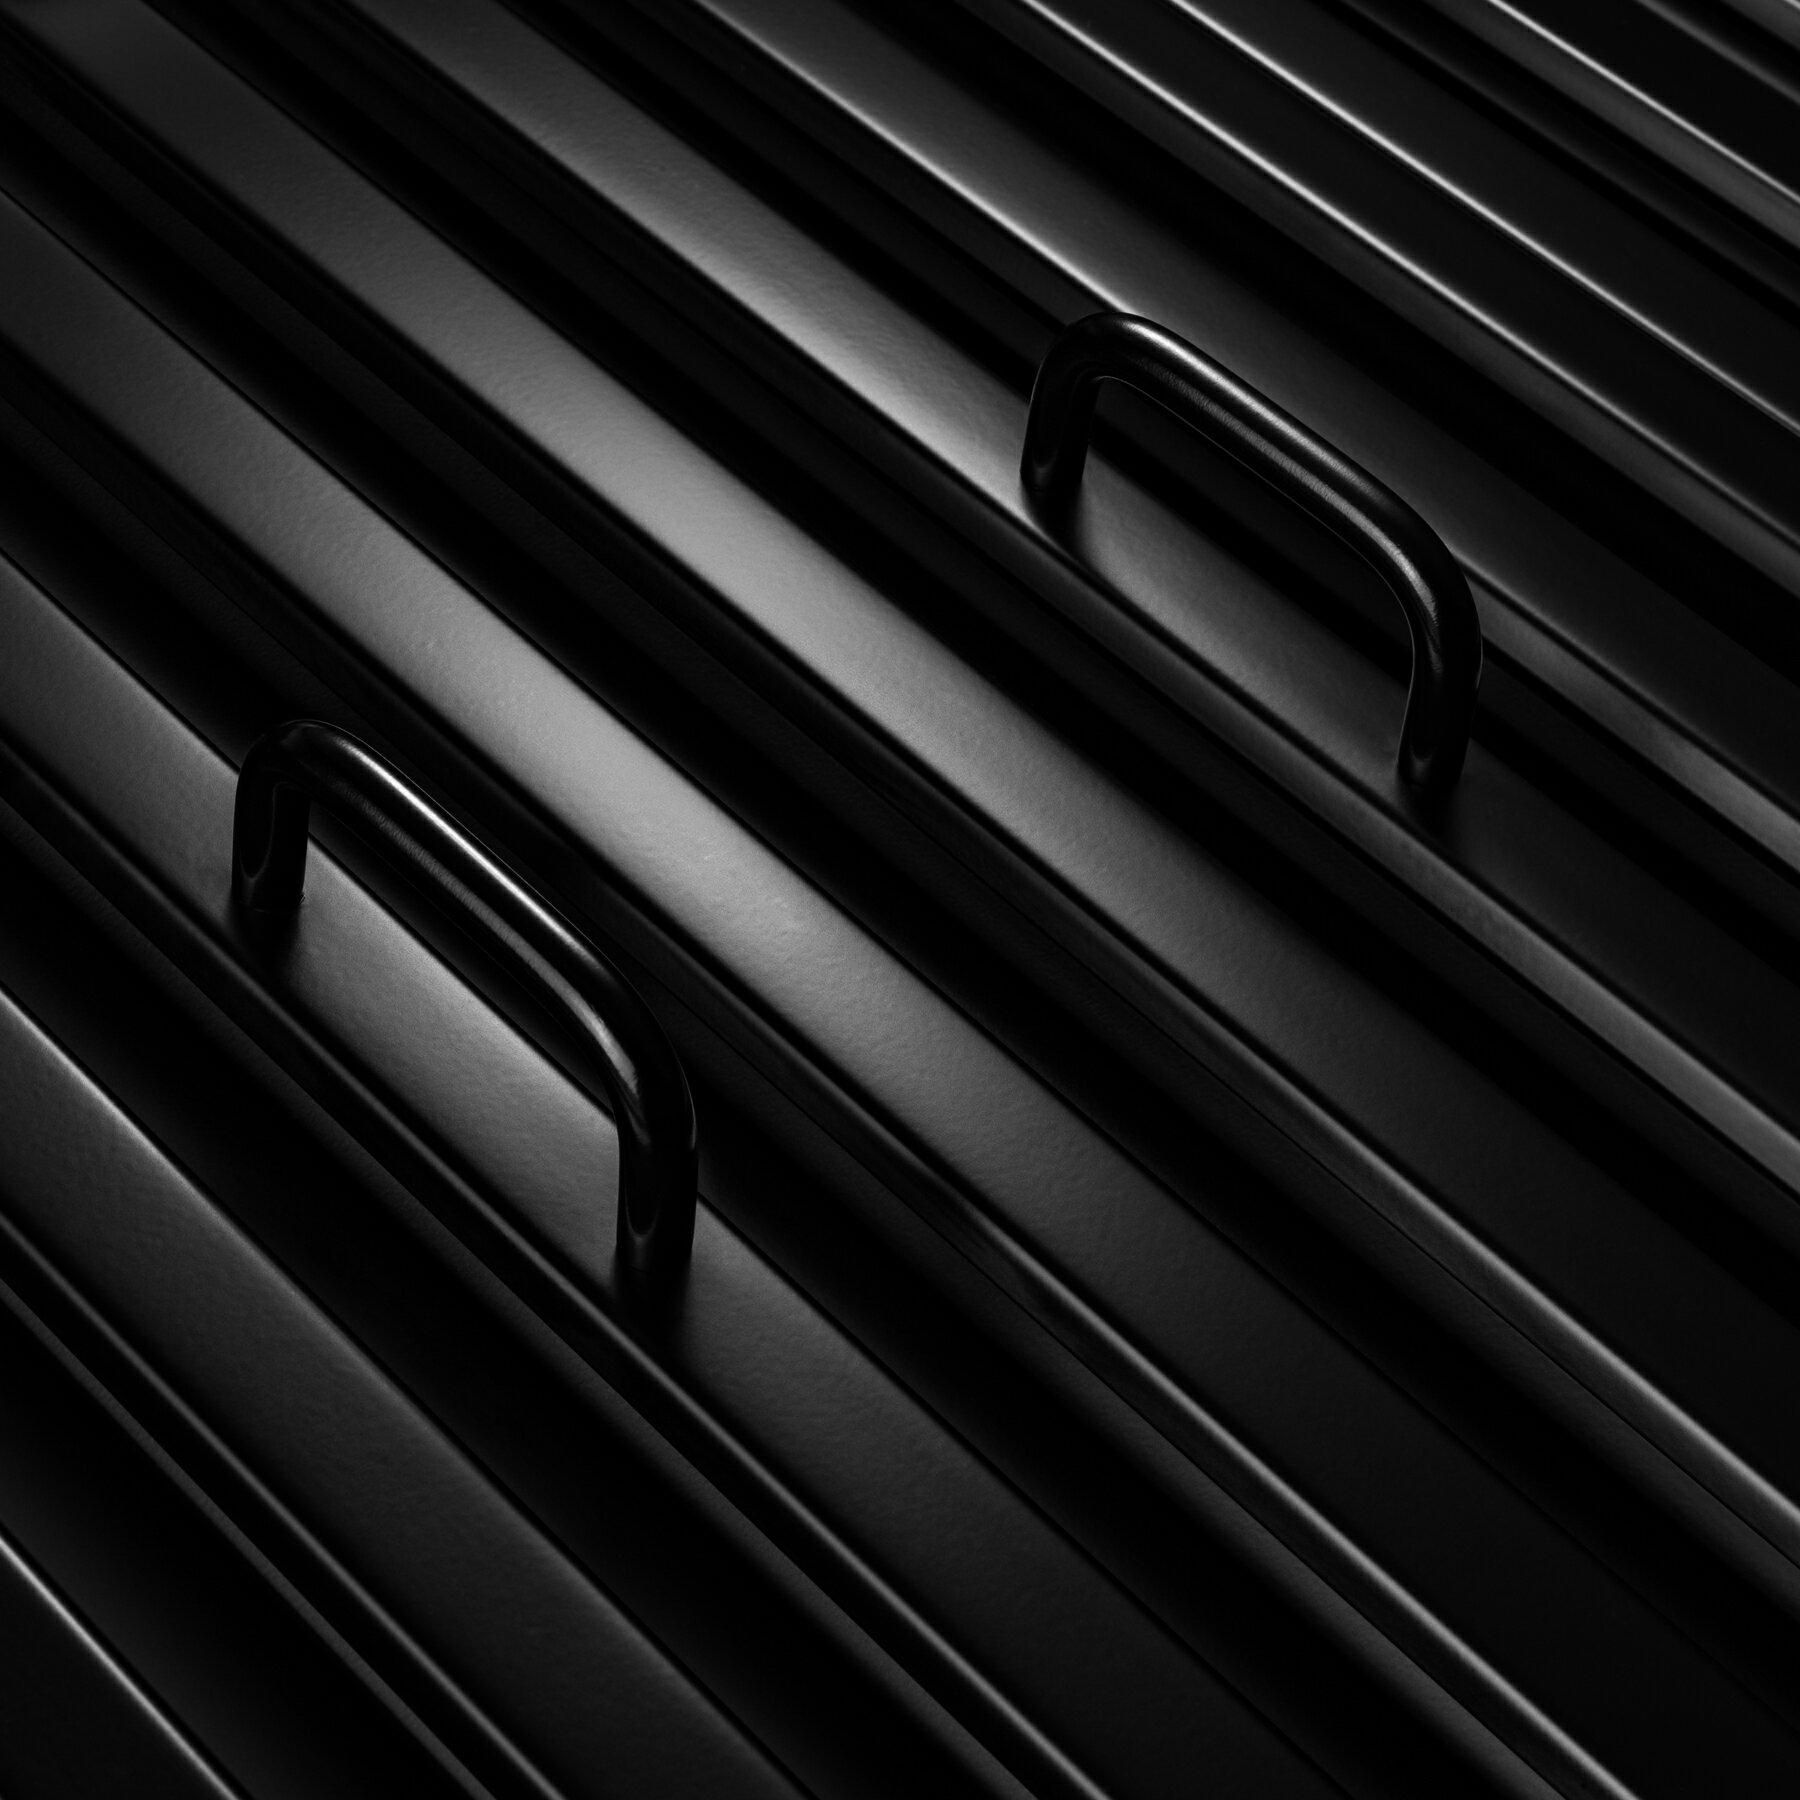 "AKDY European Style Range Hood – Stainless Steel 36"" Hood Filter – Premium  Kitchen Exhaust Fan – Under Cabinet Range Hood – Matte Black Painted Finish  ..."